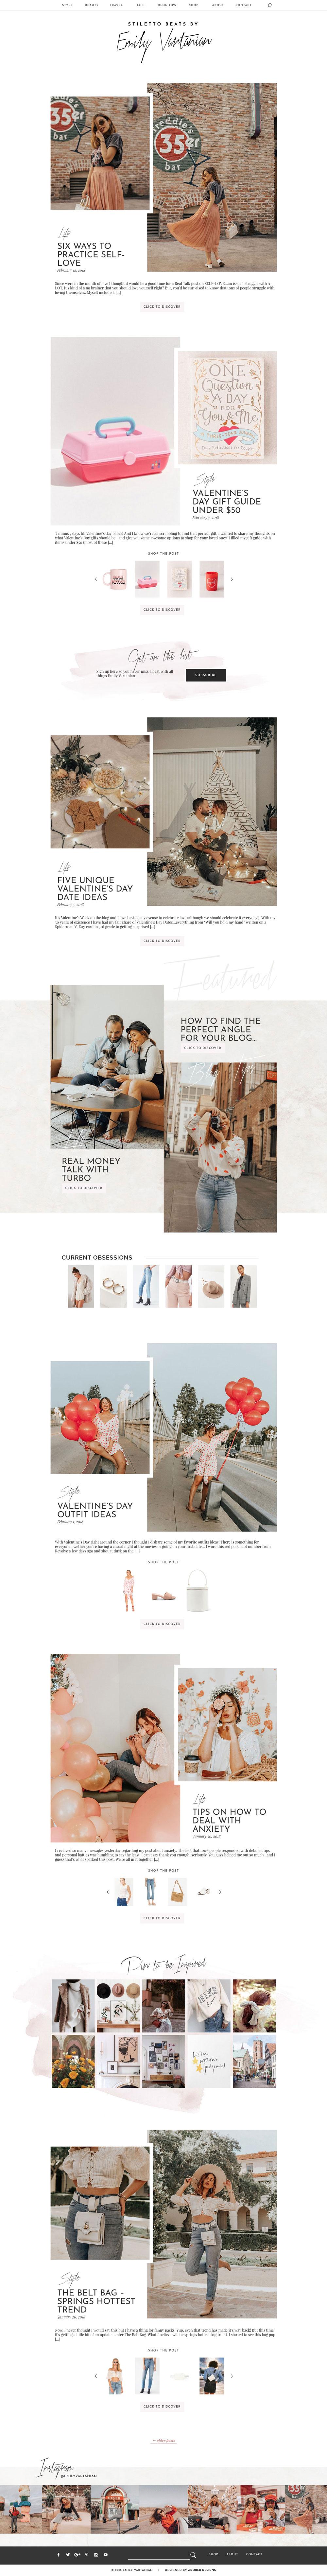 Stiletto Beats, Emily Vartanian new website by Adored Designs